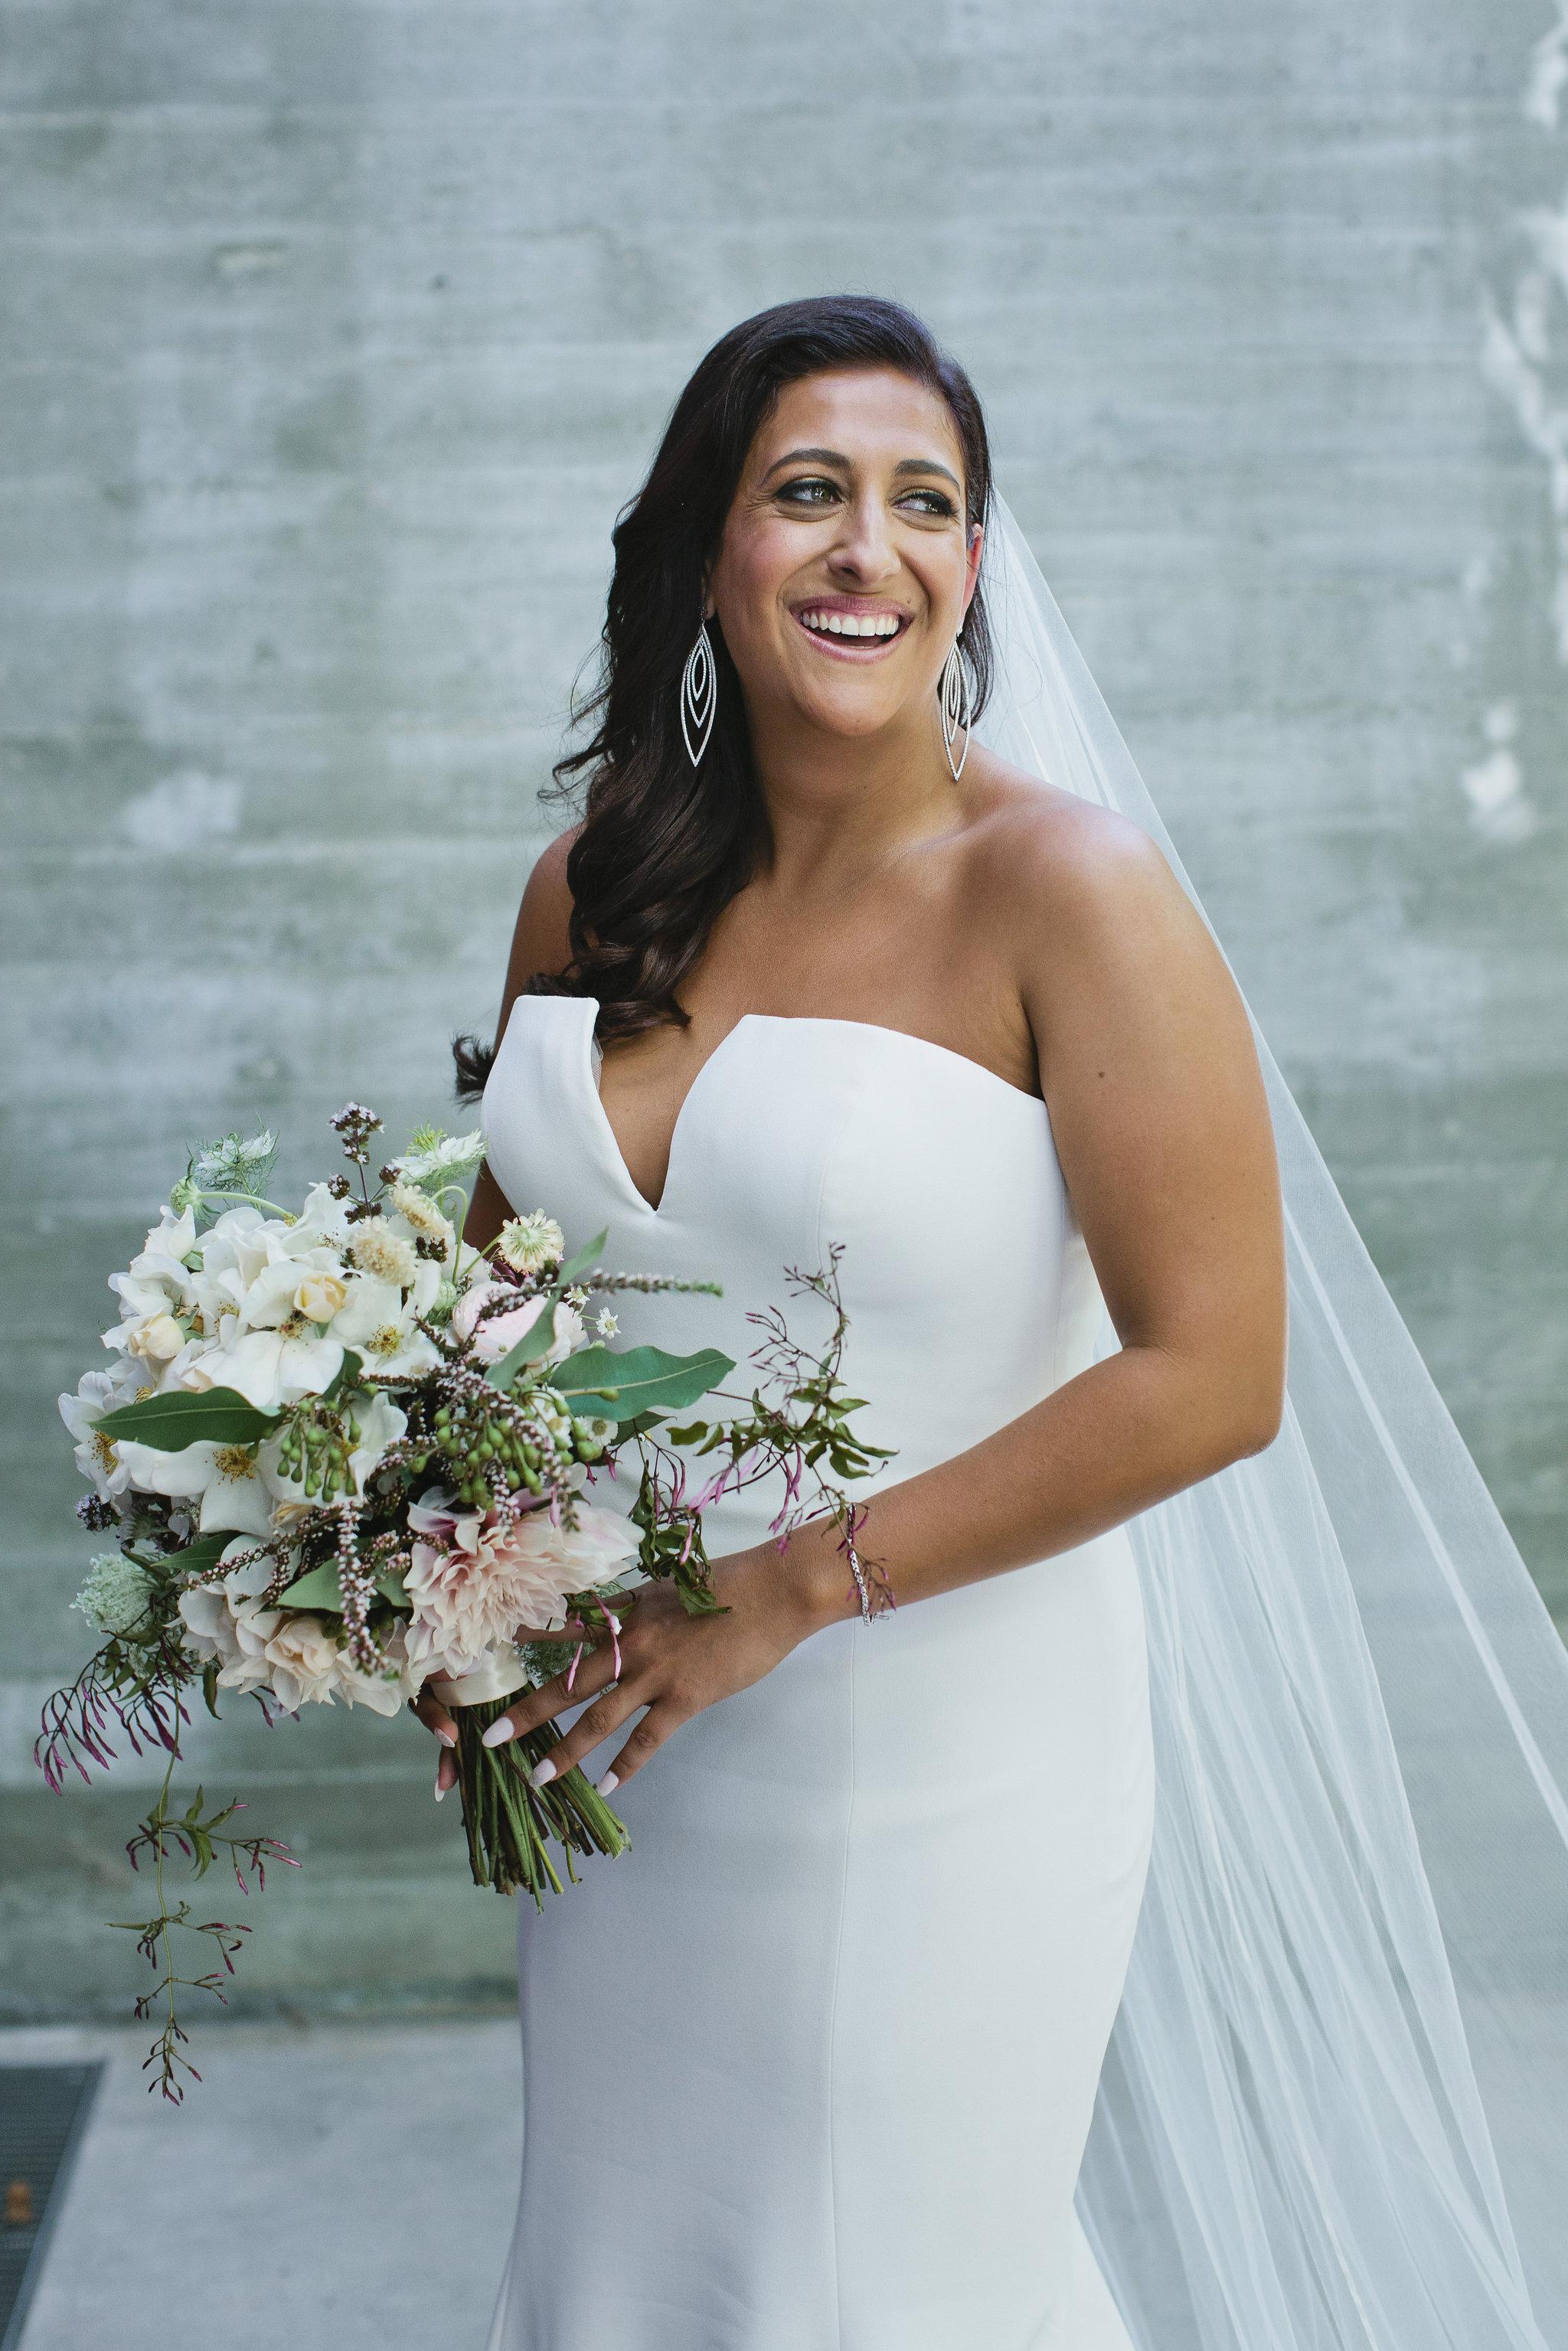 Barndiva-Healdsburg-Wedding-012.JPG